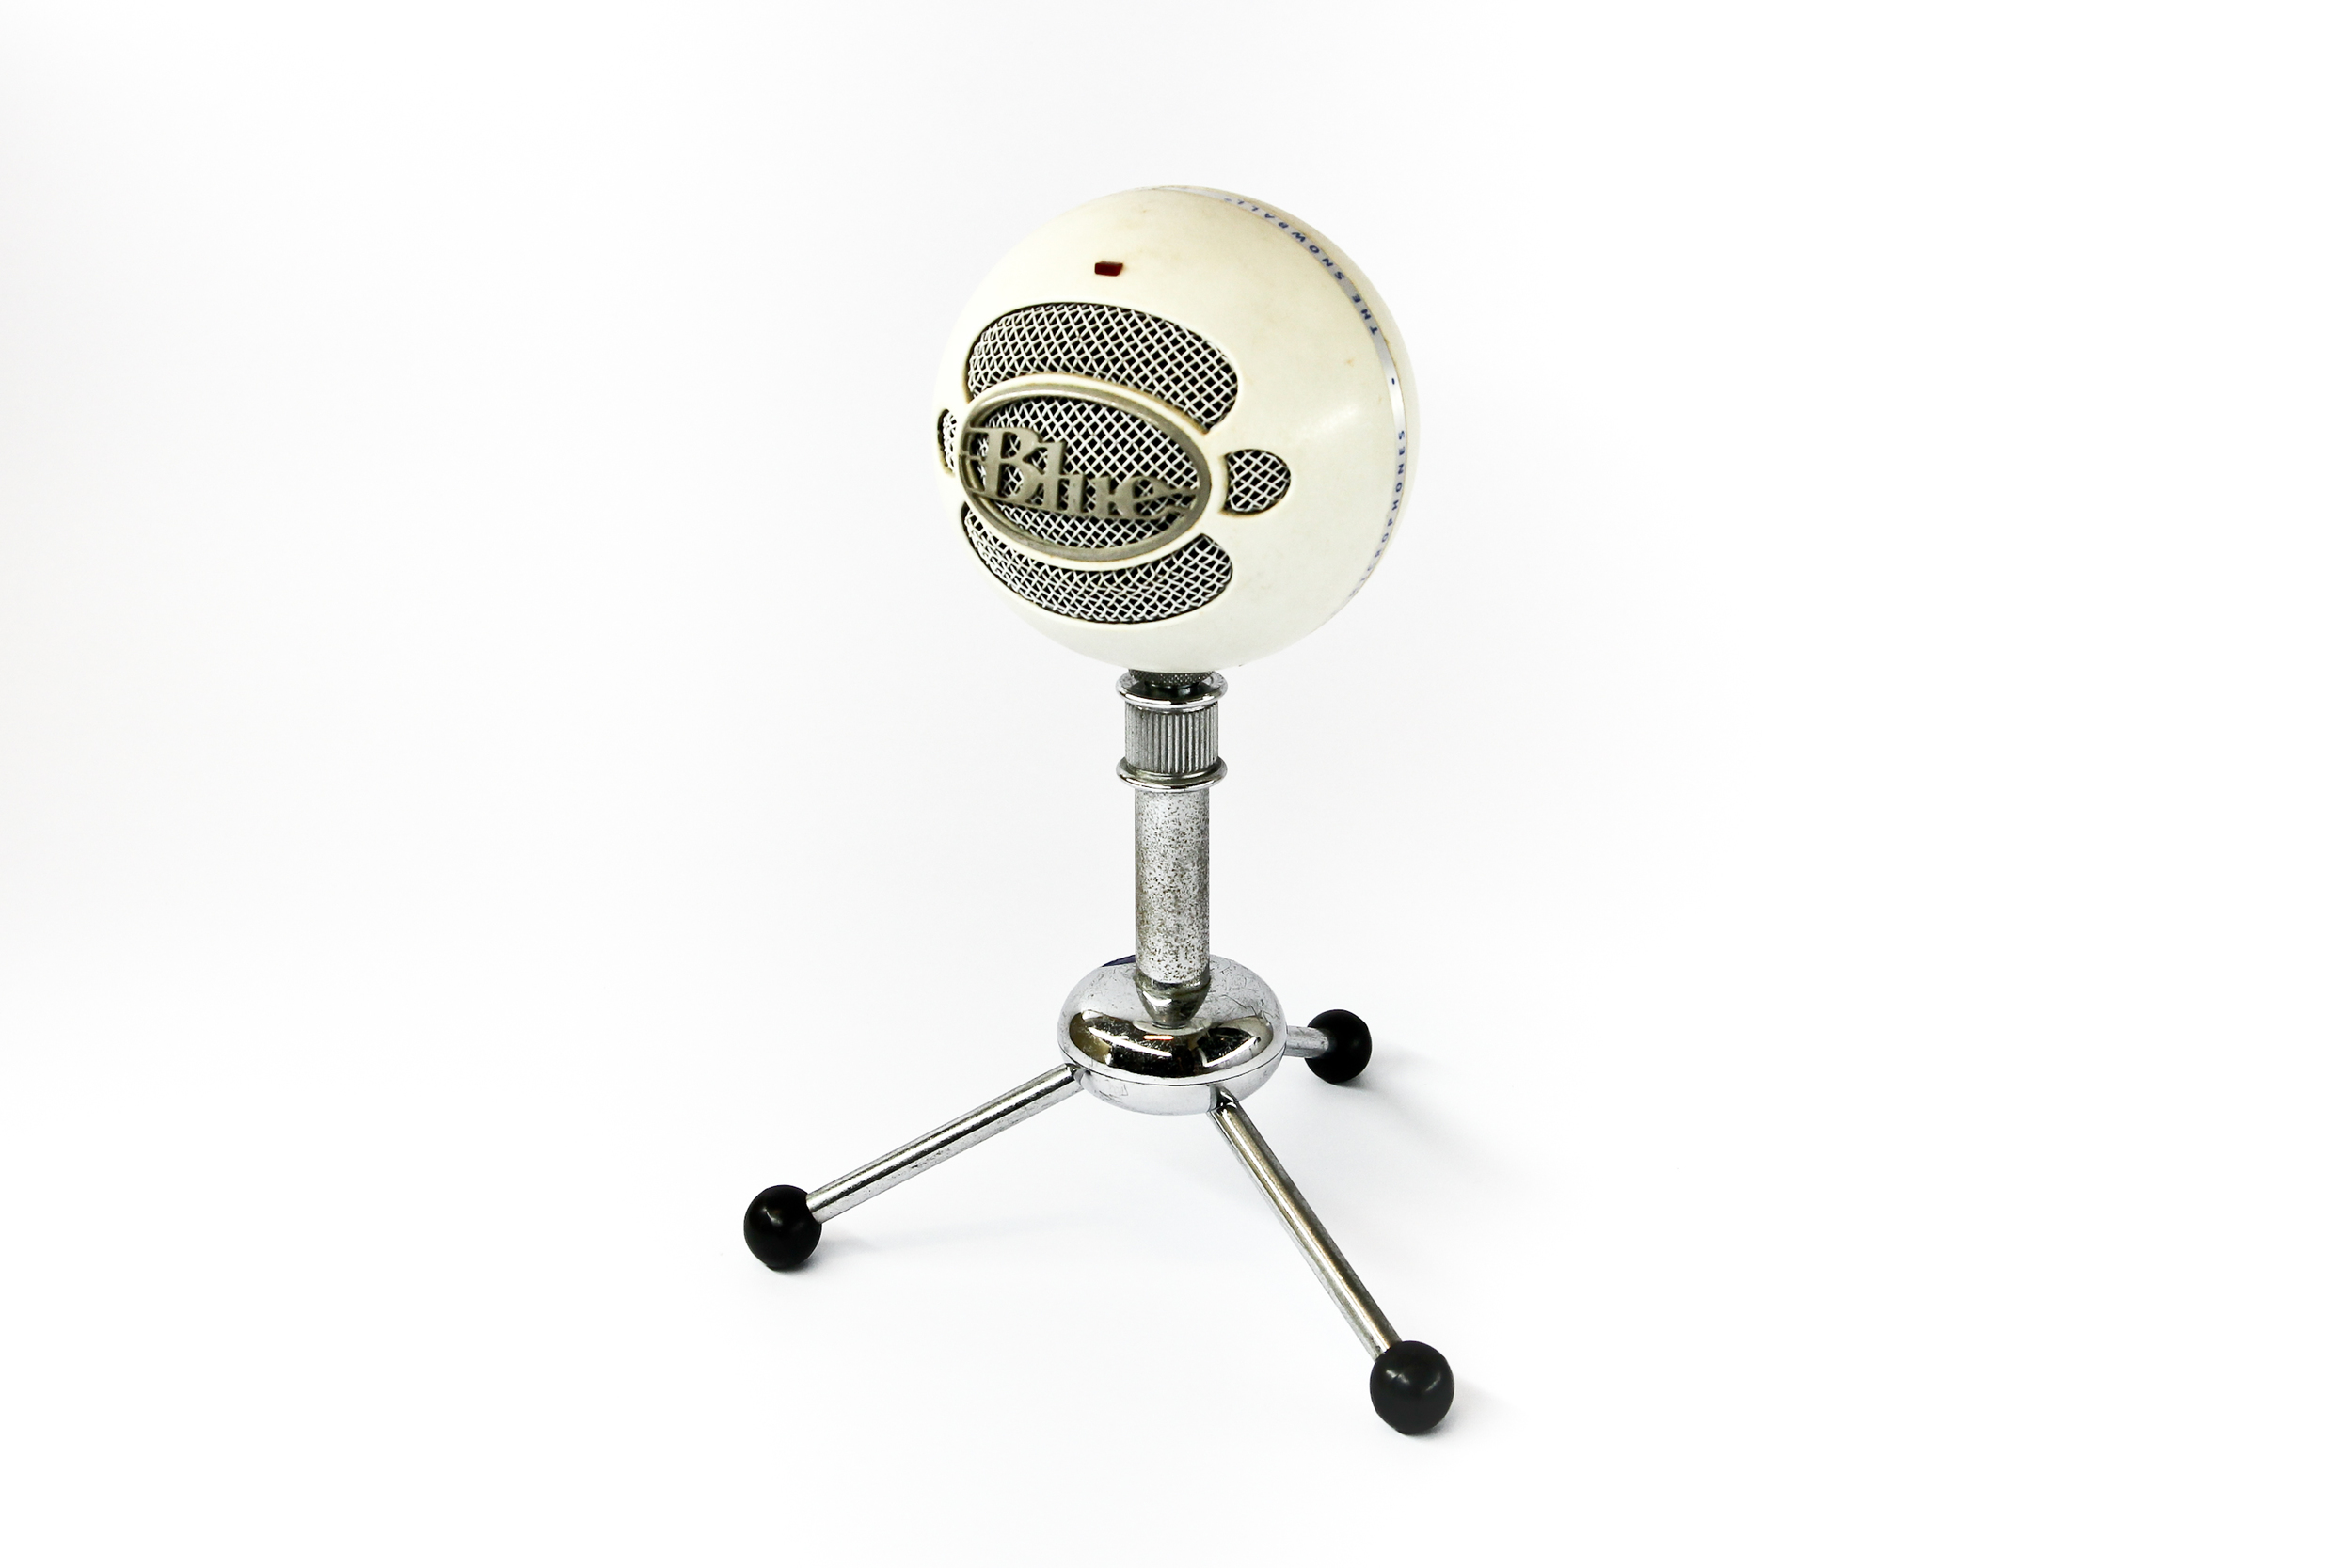 Digital microphone on tripod